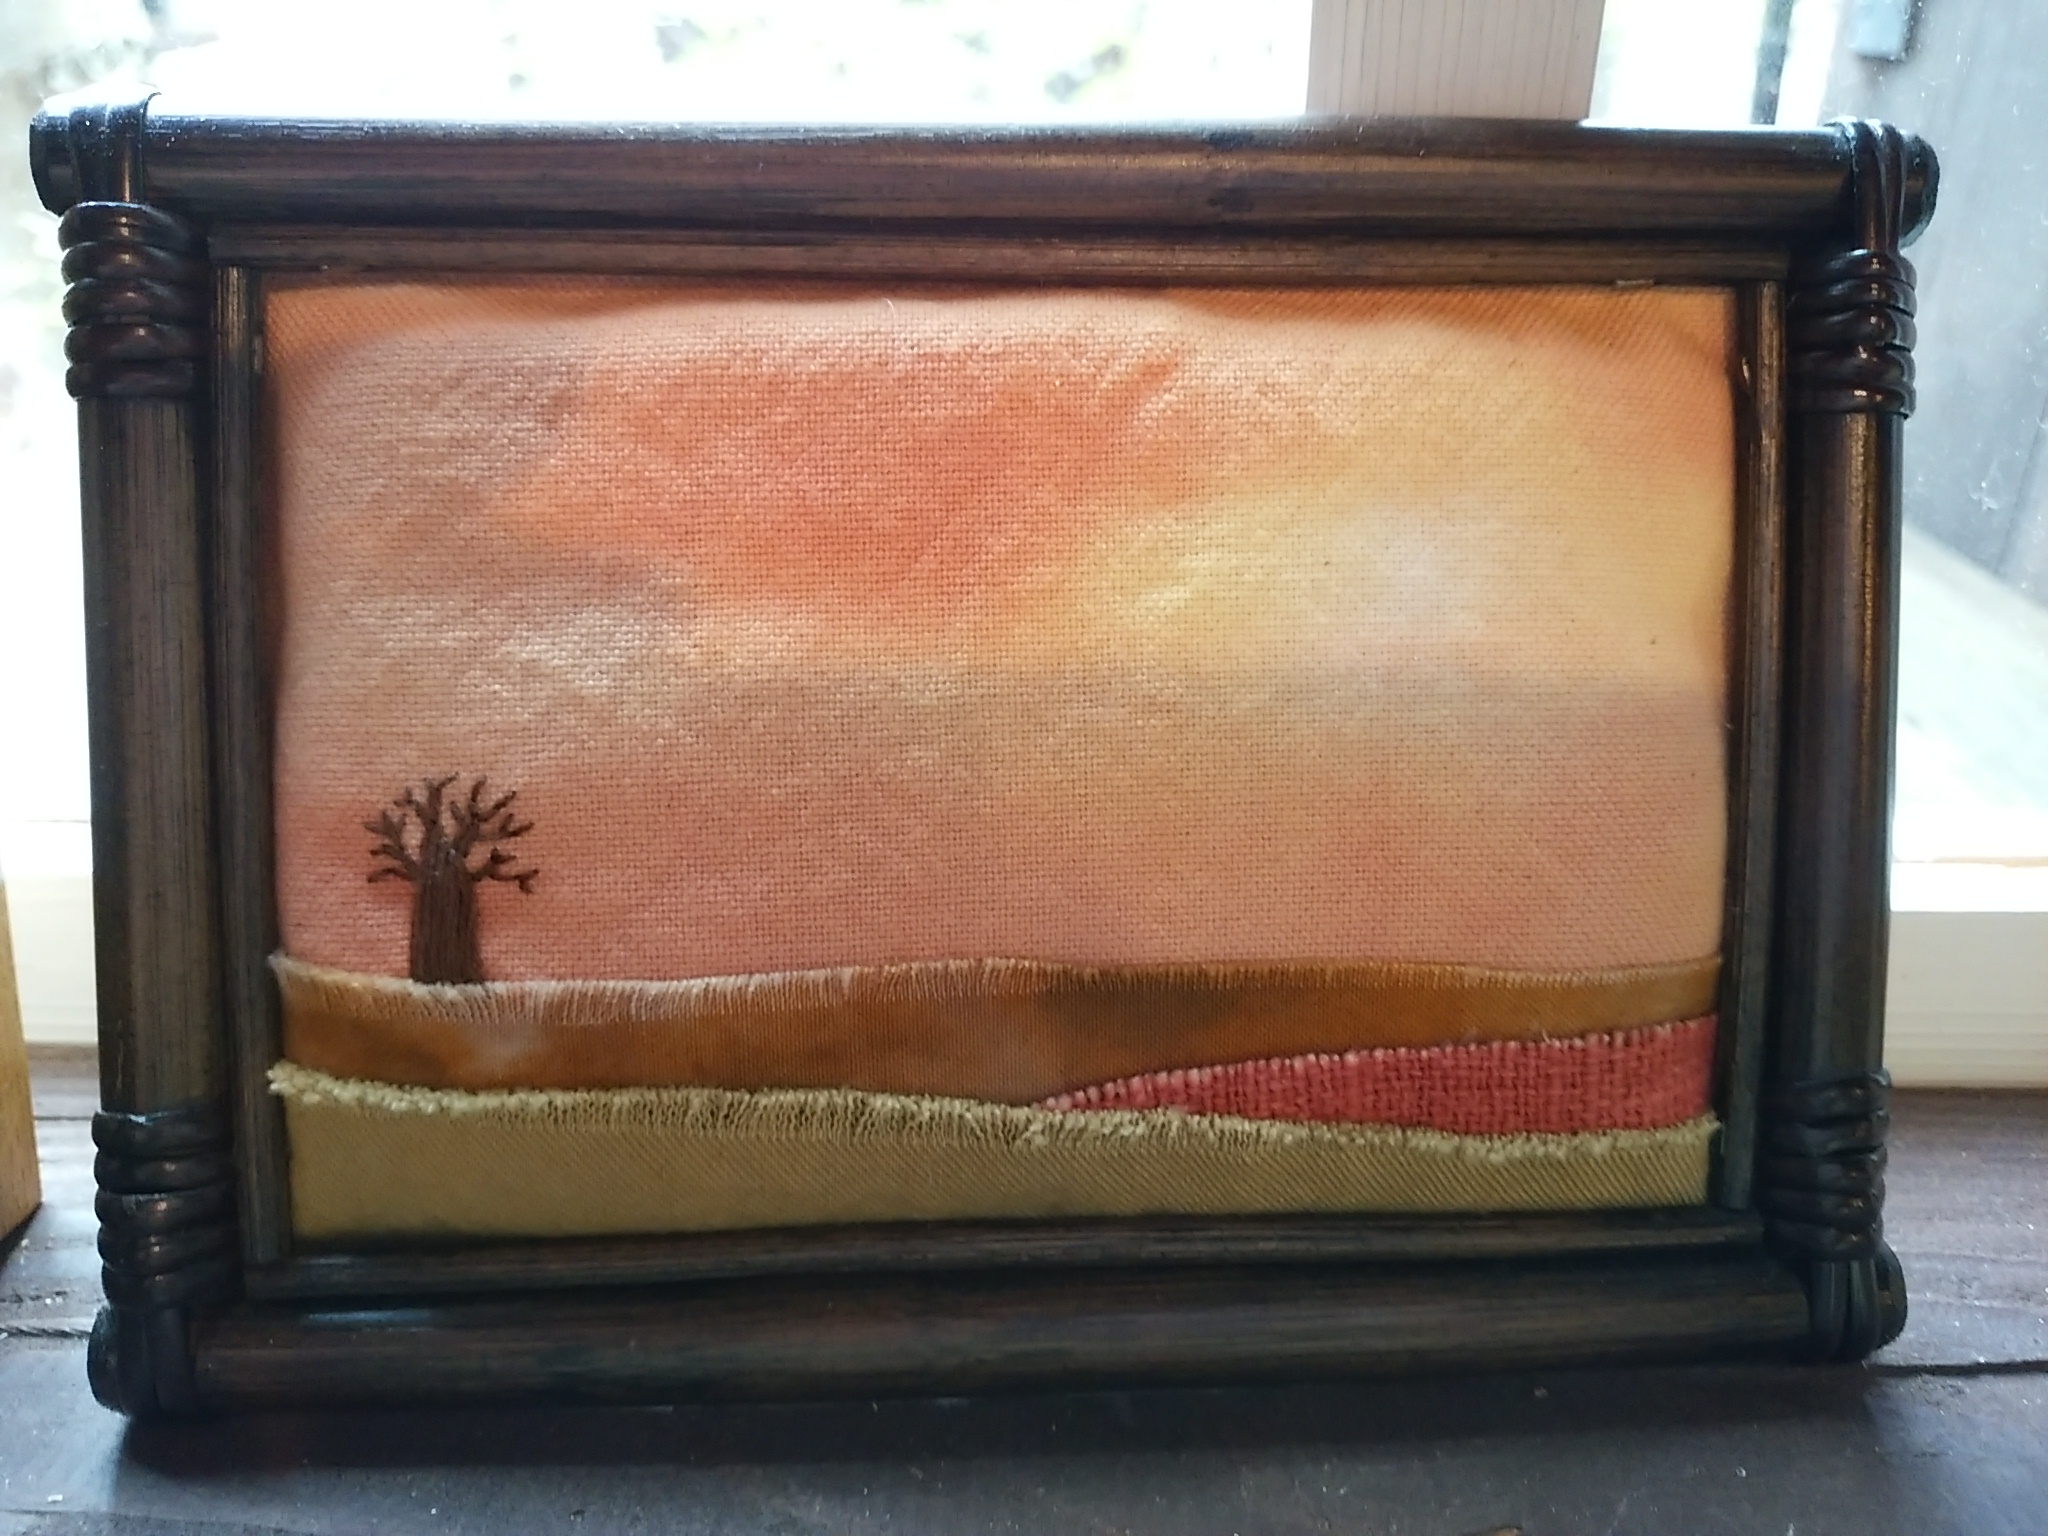 布絵 額絵 竹額 刺繍 art 空 木 バオバブ 風景